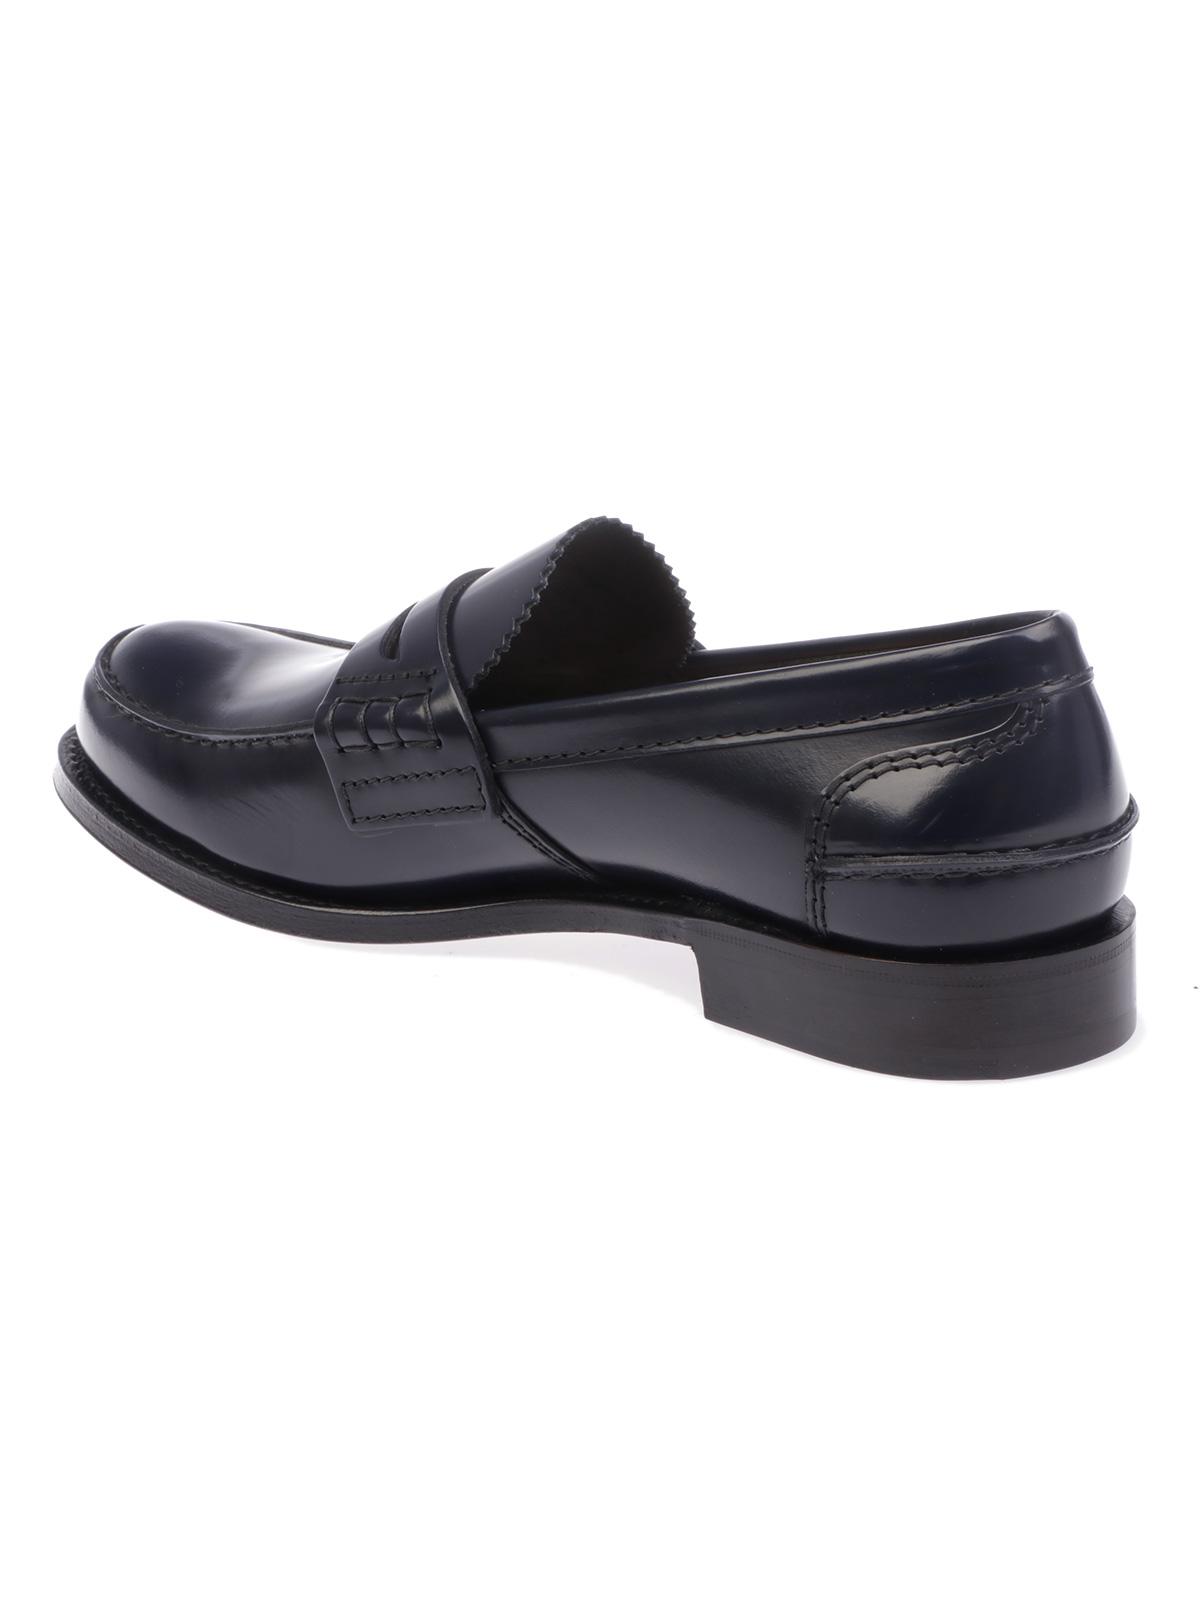 Picture of CHURCH'S | Men's Tunbridge Loafer